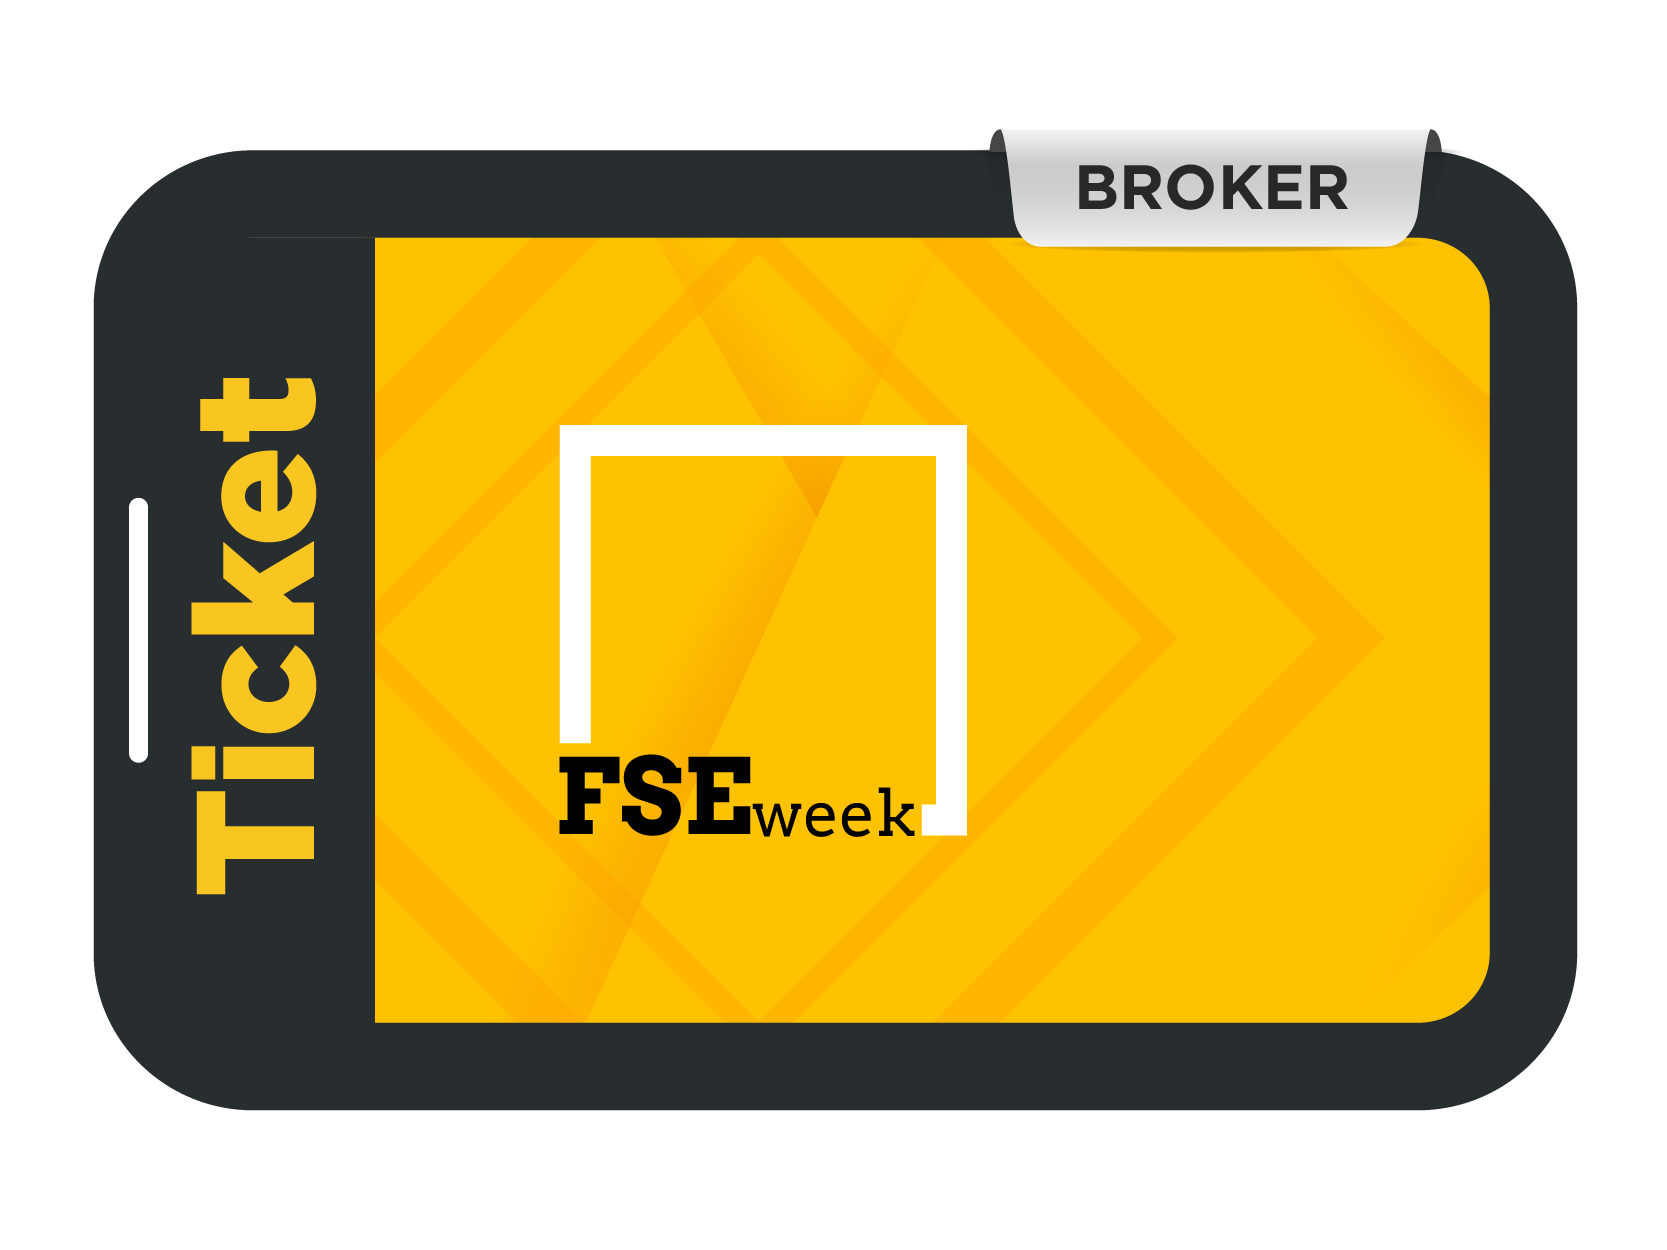 Broker Ticket - FSE Week 2021